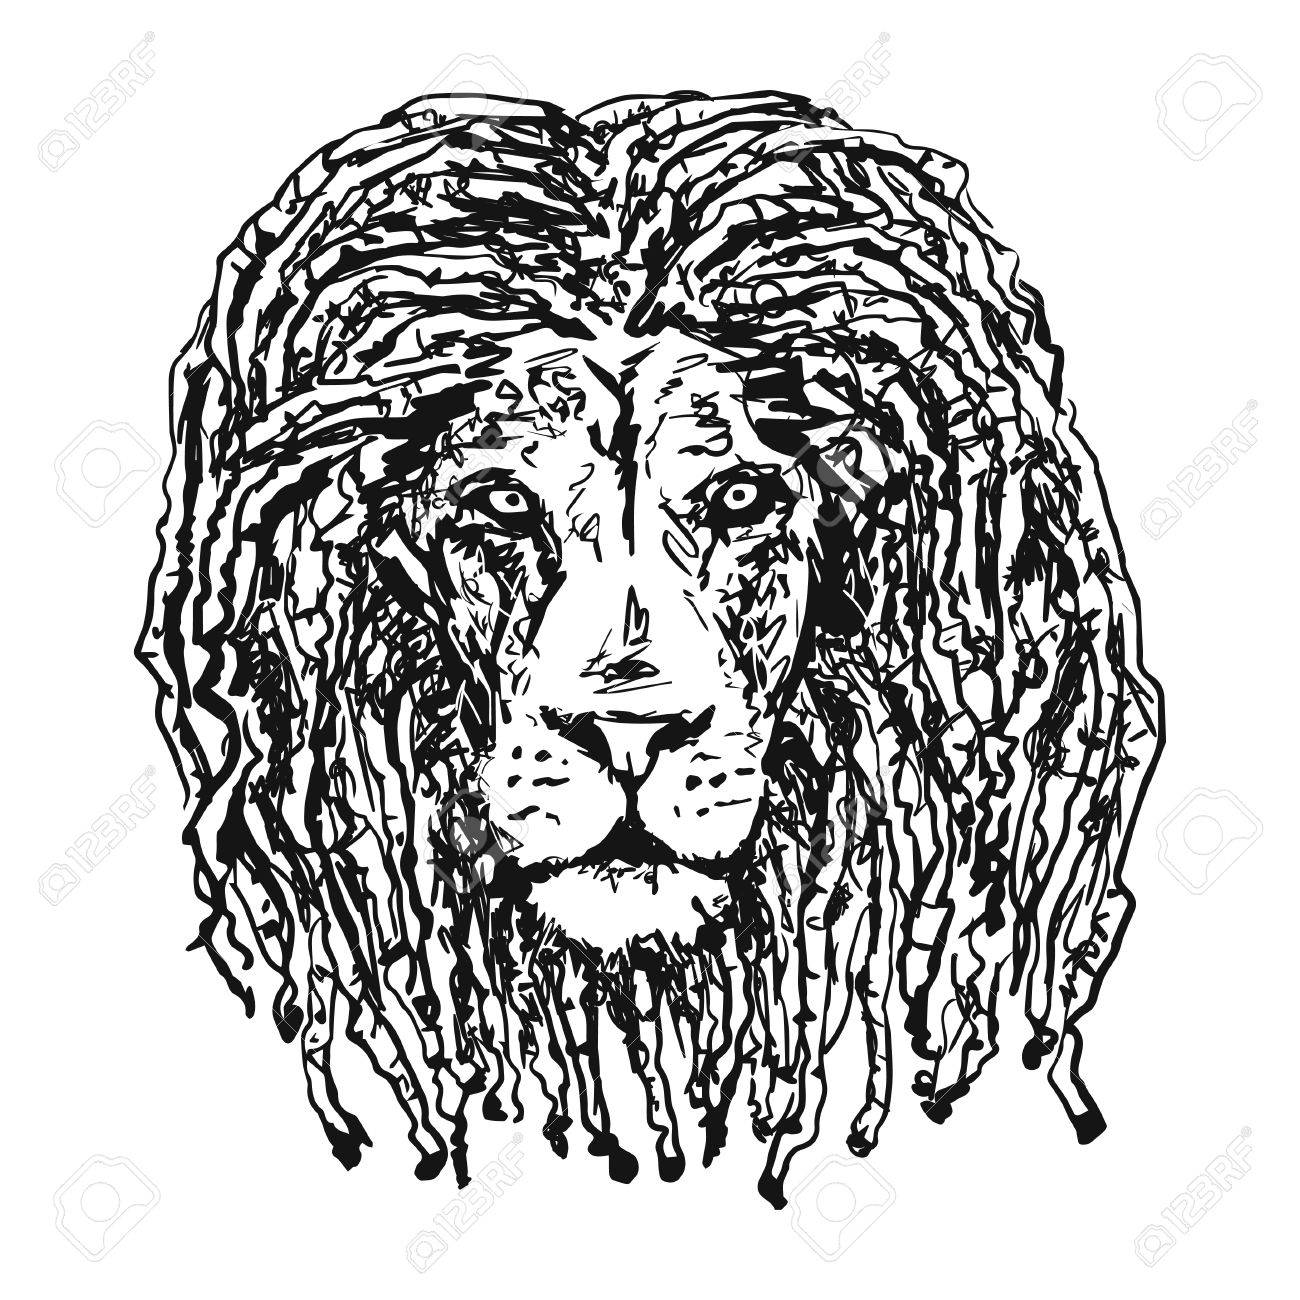 1300x1300 Isolated Vectorhead Lion With Dreadlocks As A Symbol